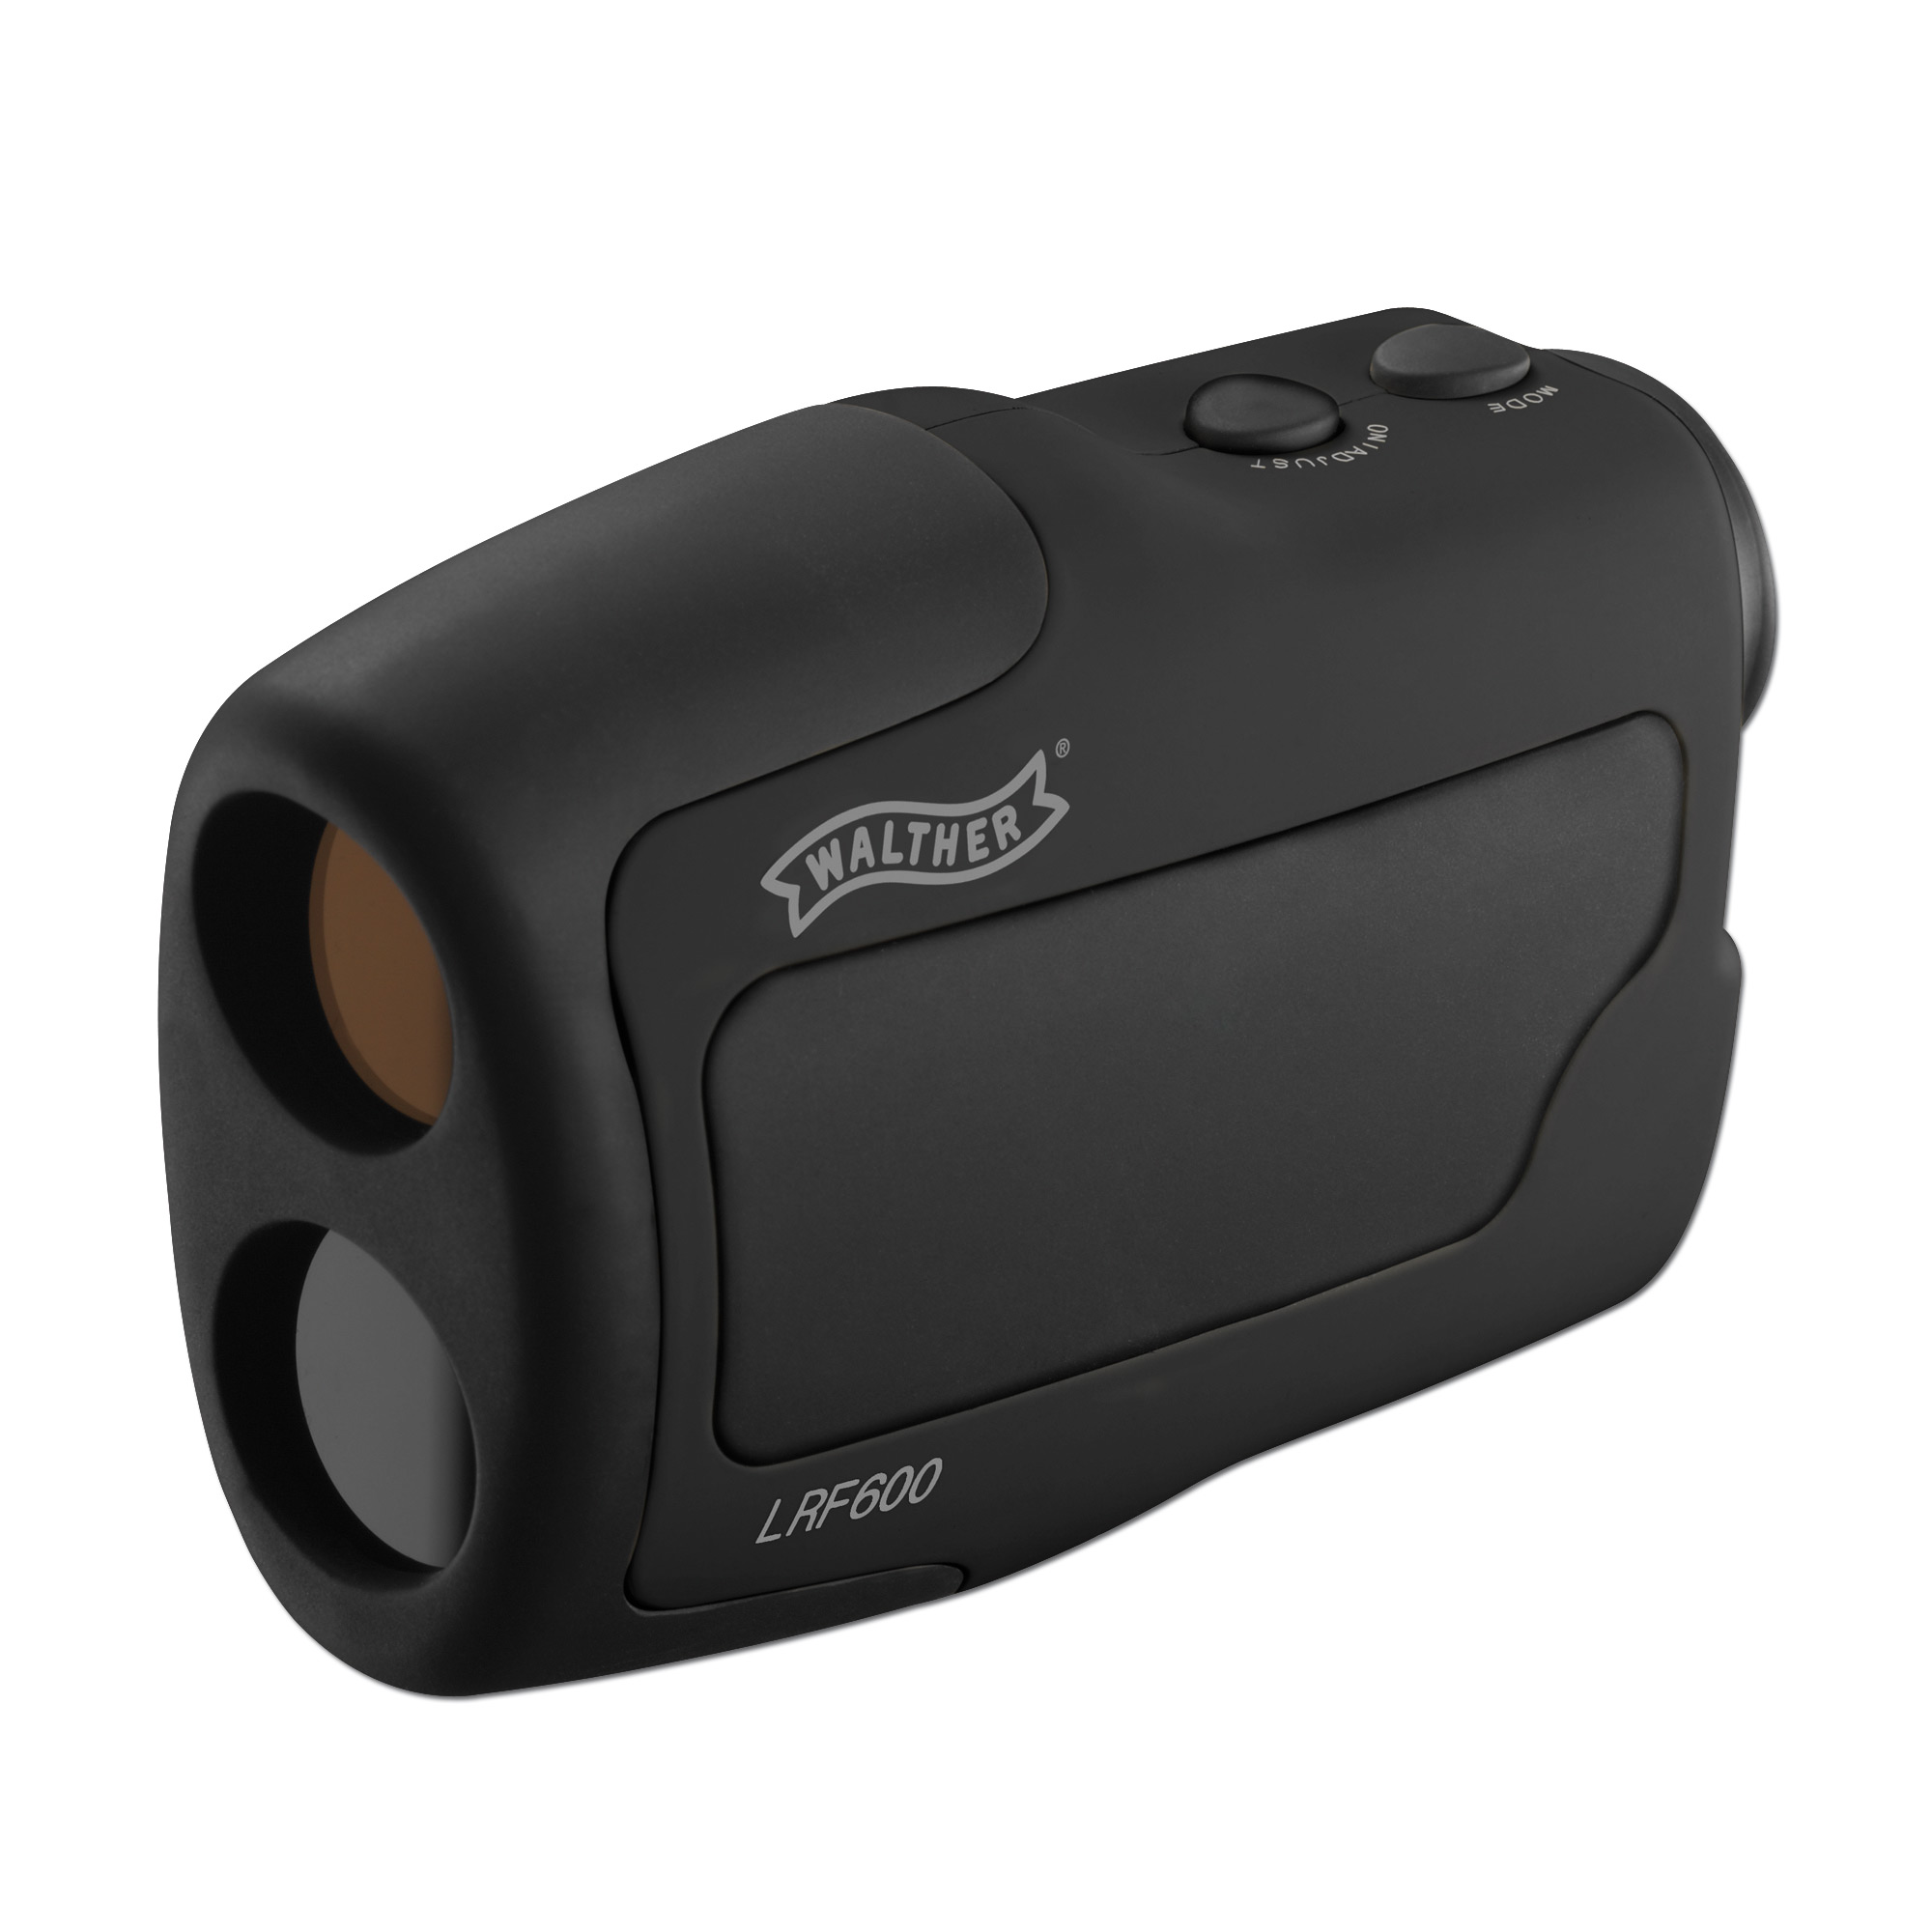 Walther Laser Range Finder LRF 600